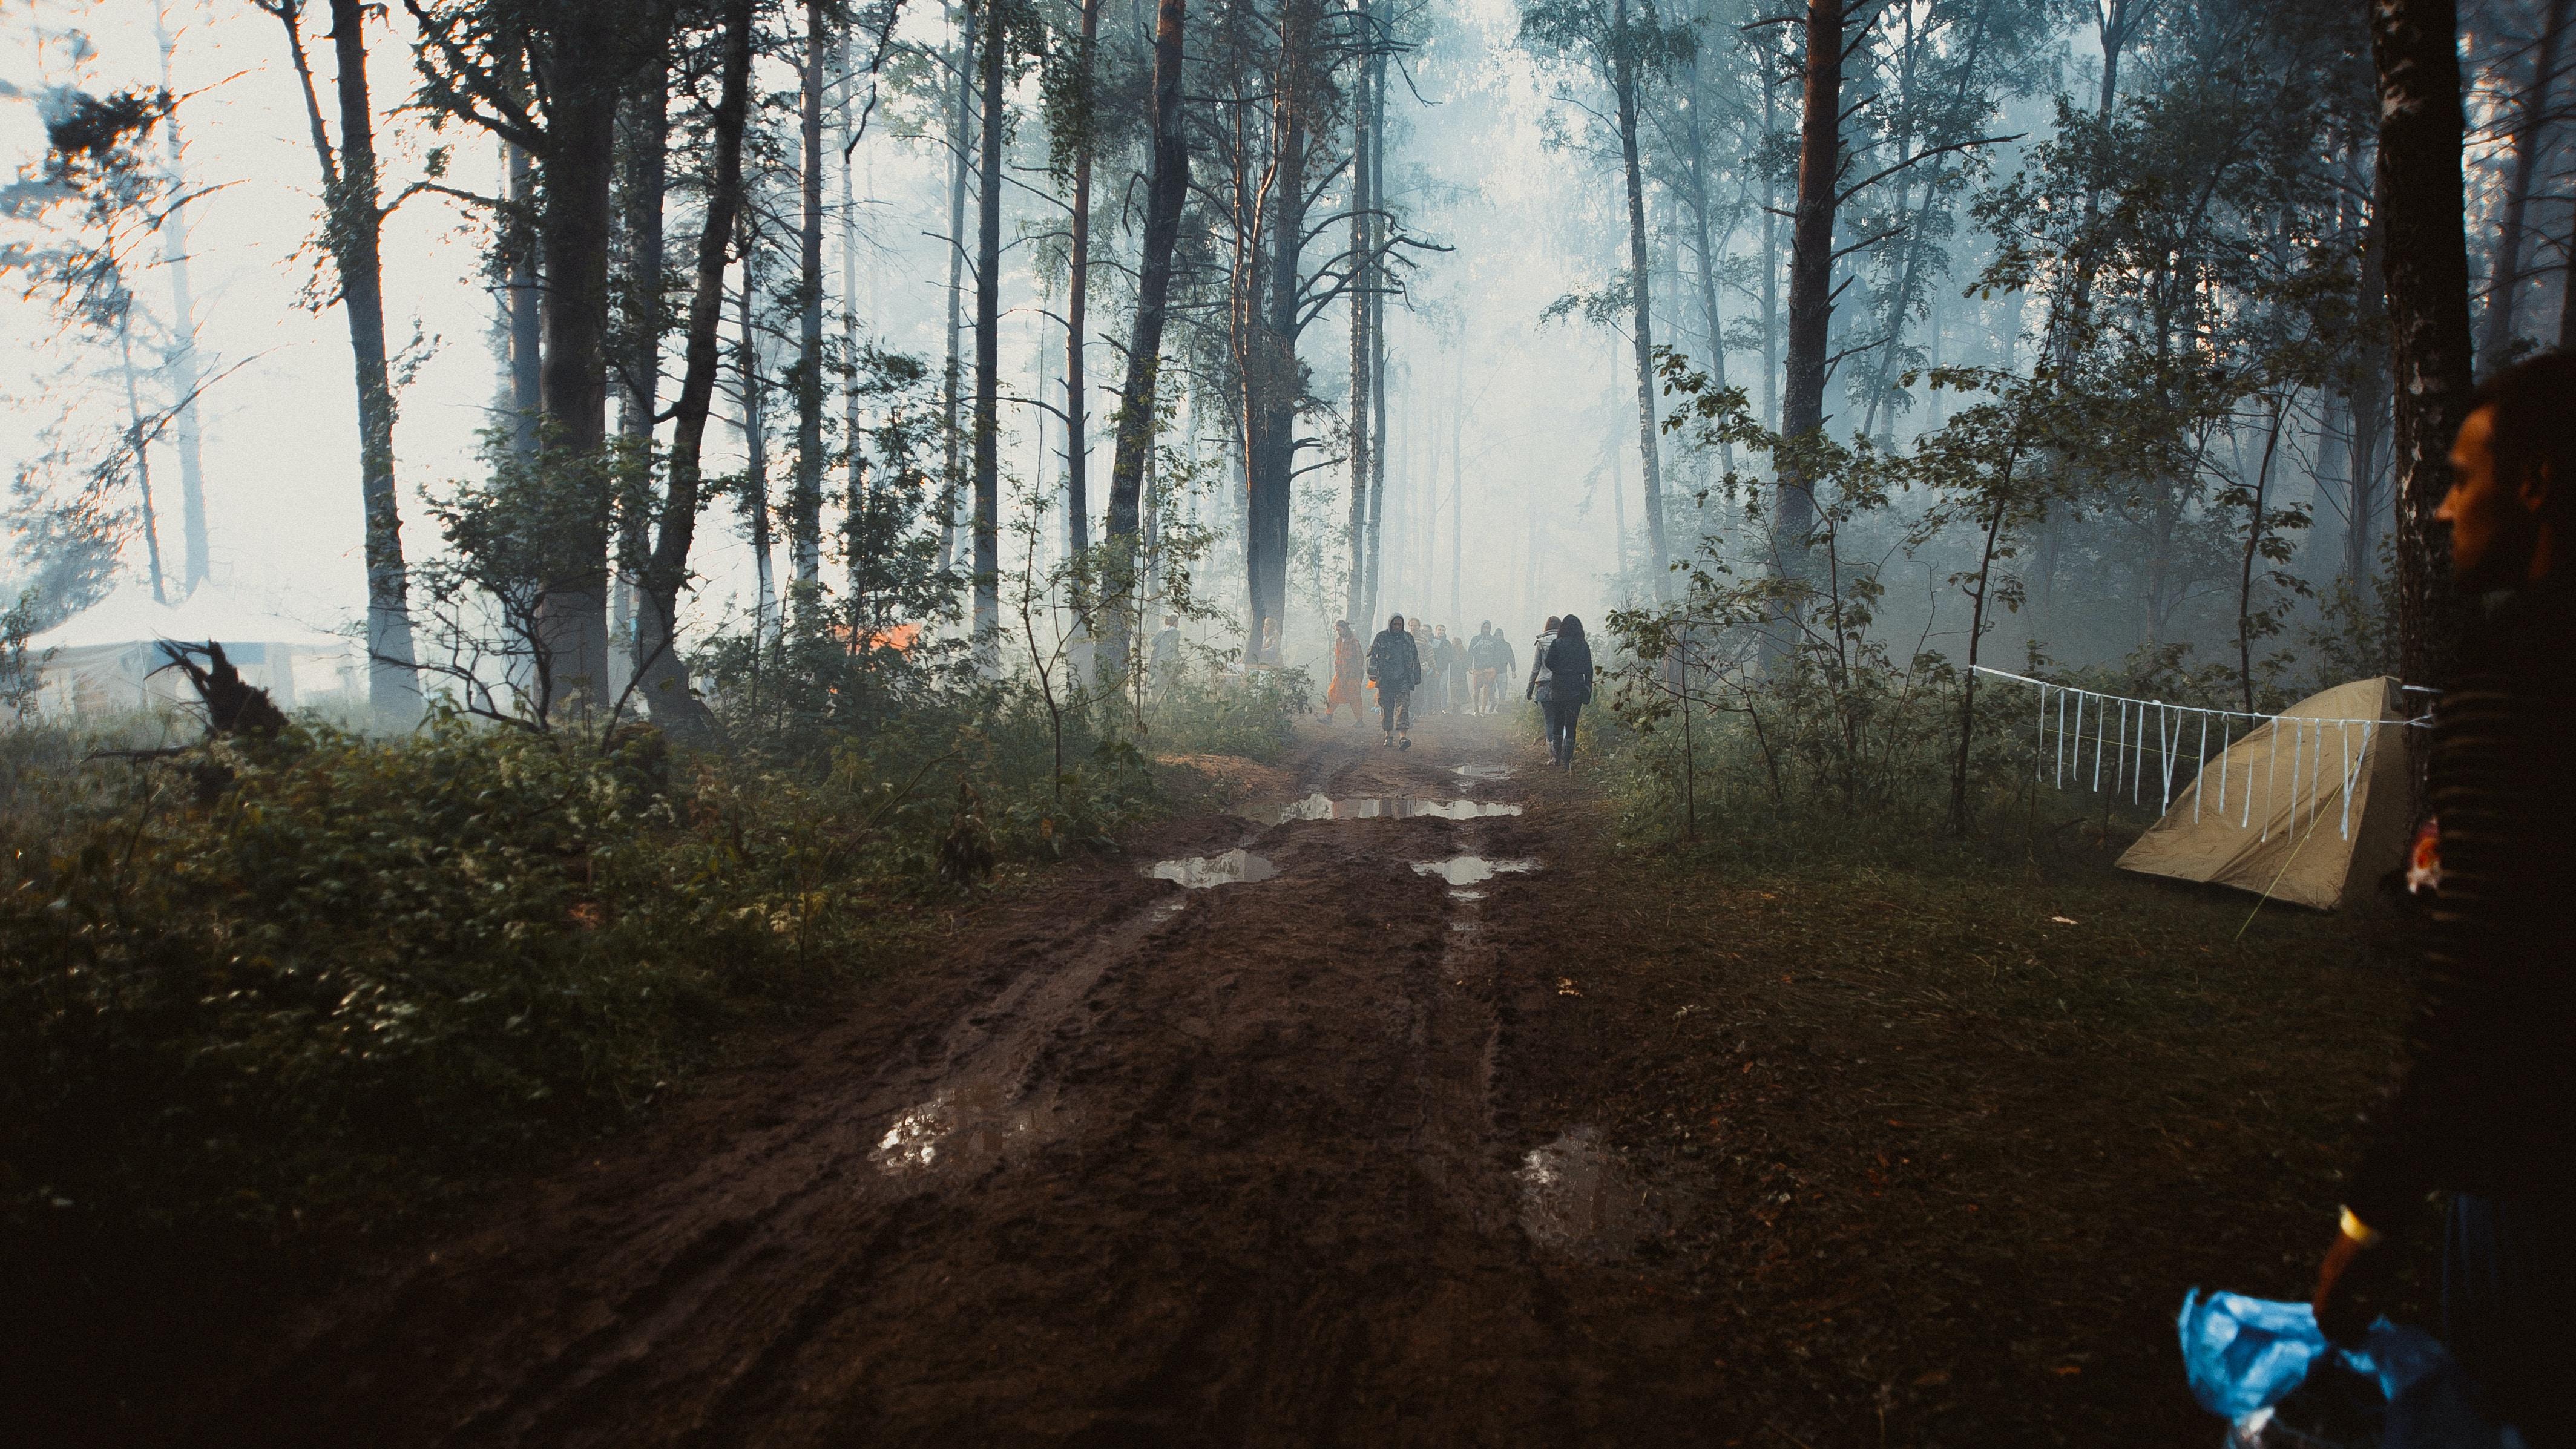 people walking in forest trail